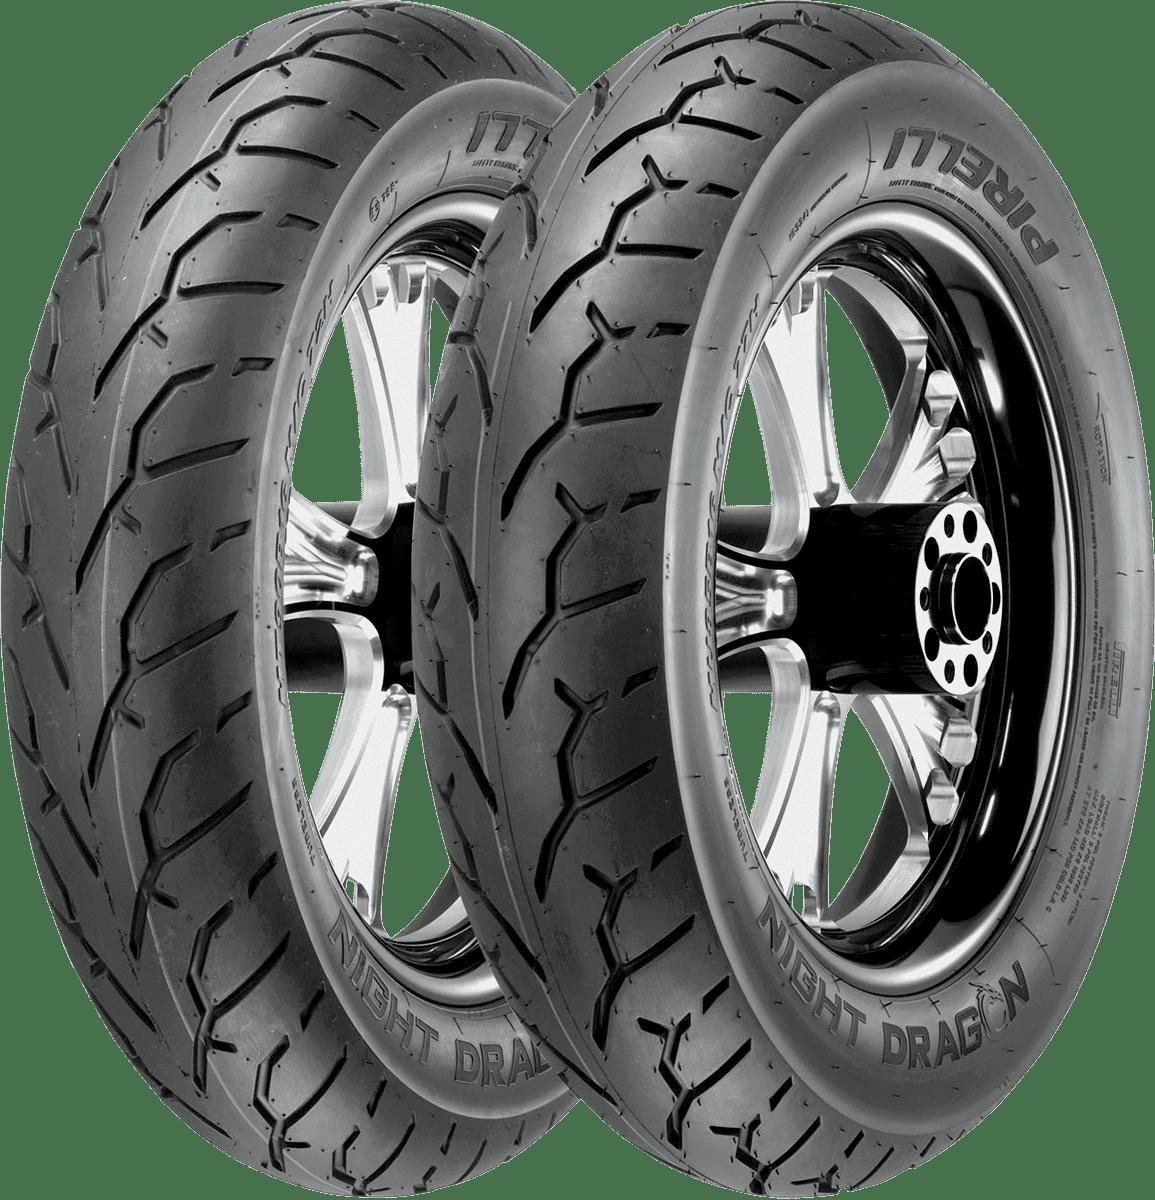 Pirelli Tire 180/65b16 Night Dragon Gt N-drg